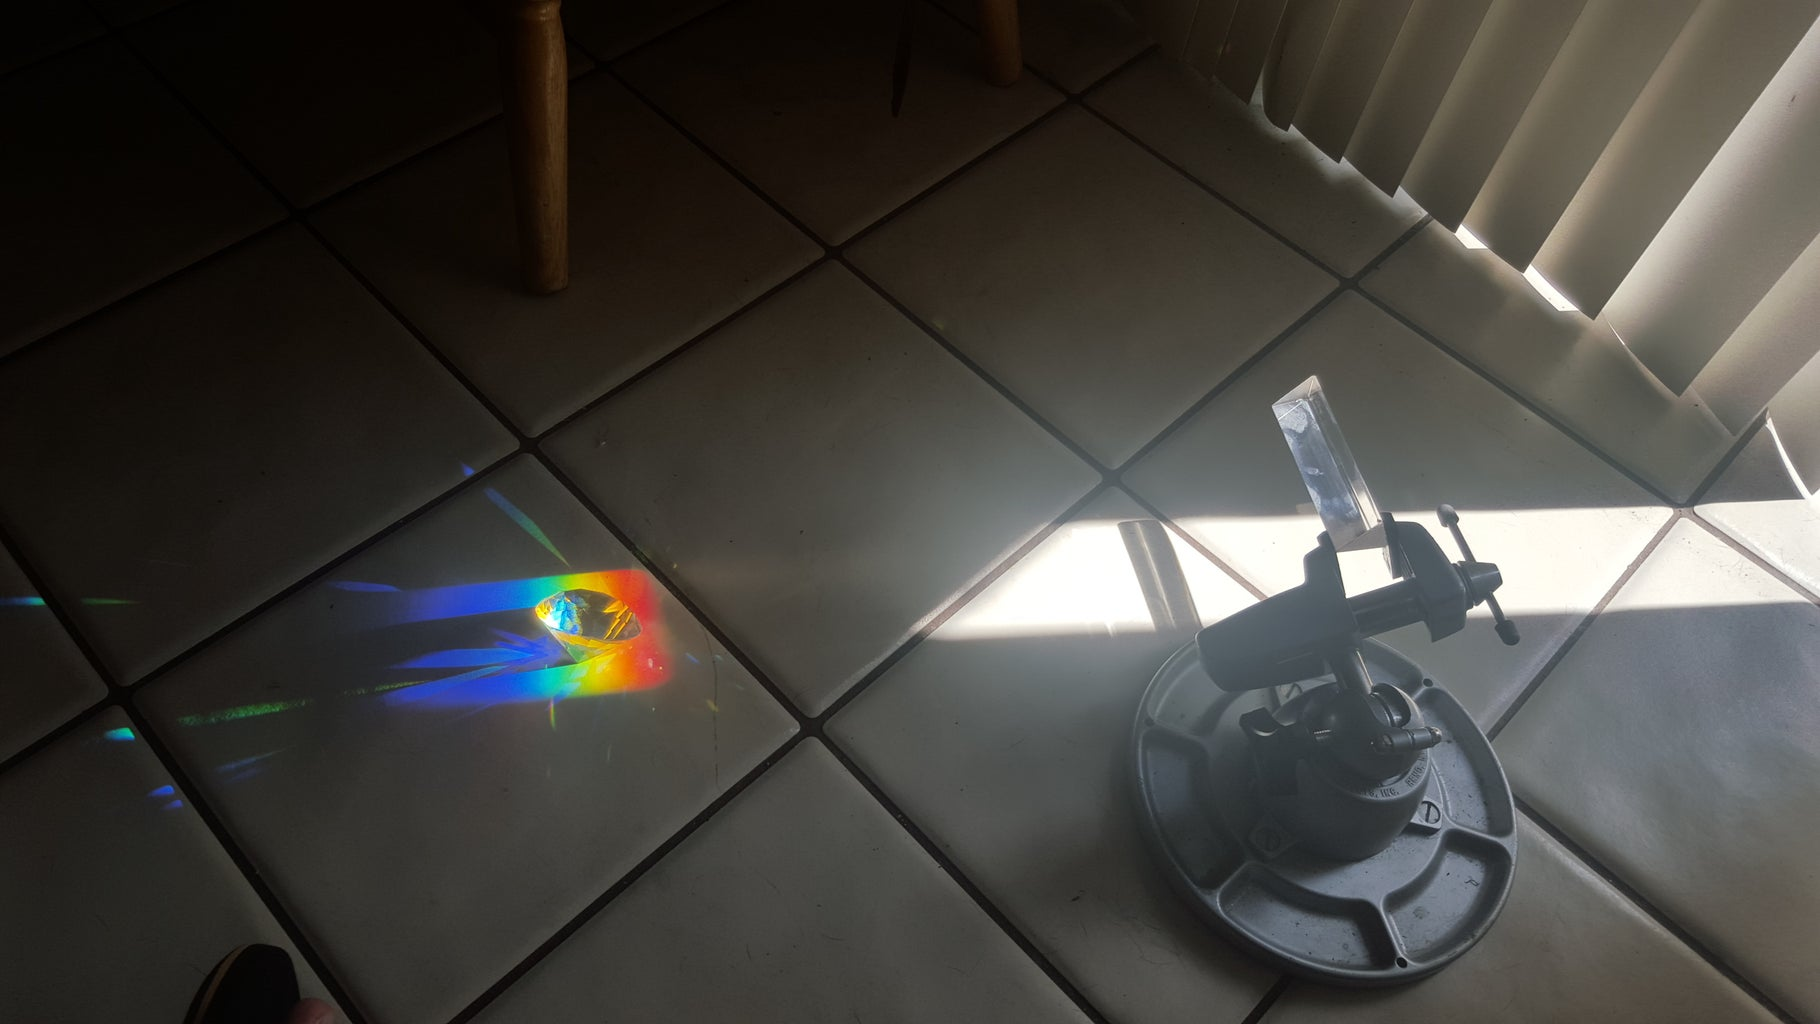 Step 3: Deconstruct the Rainbow!